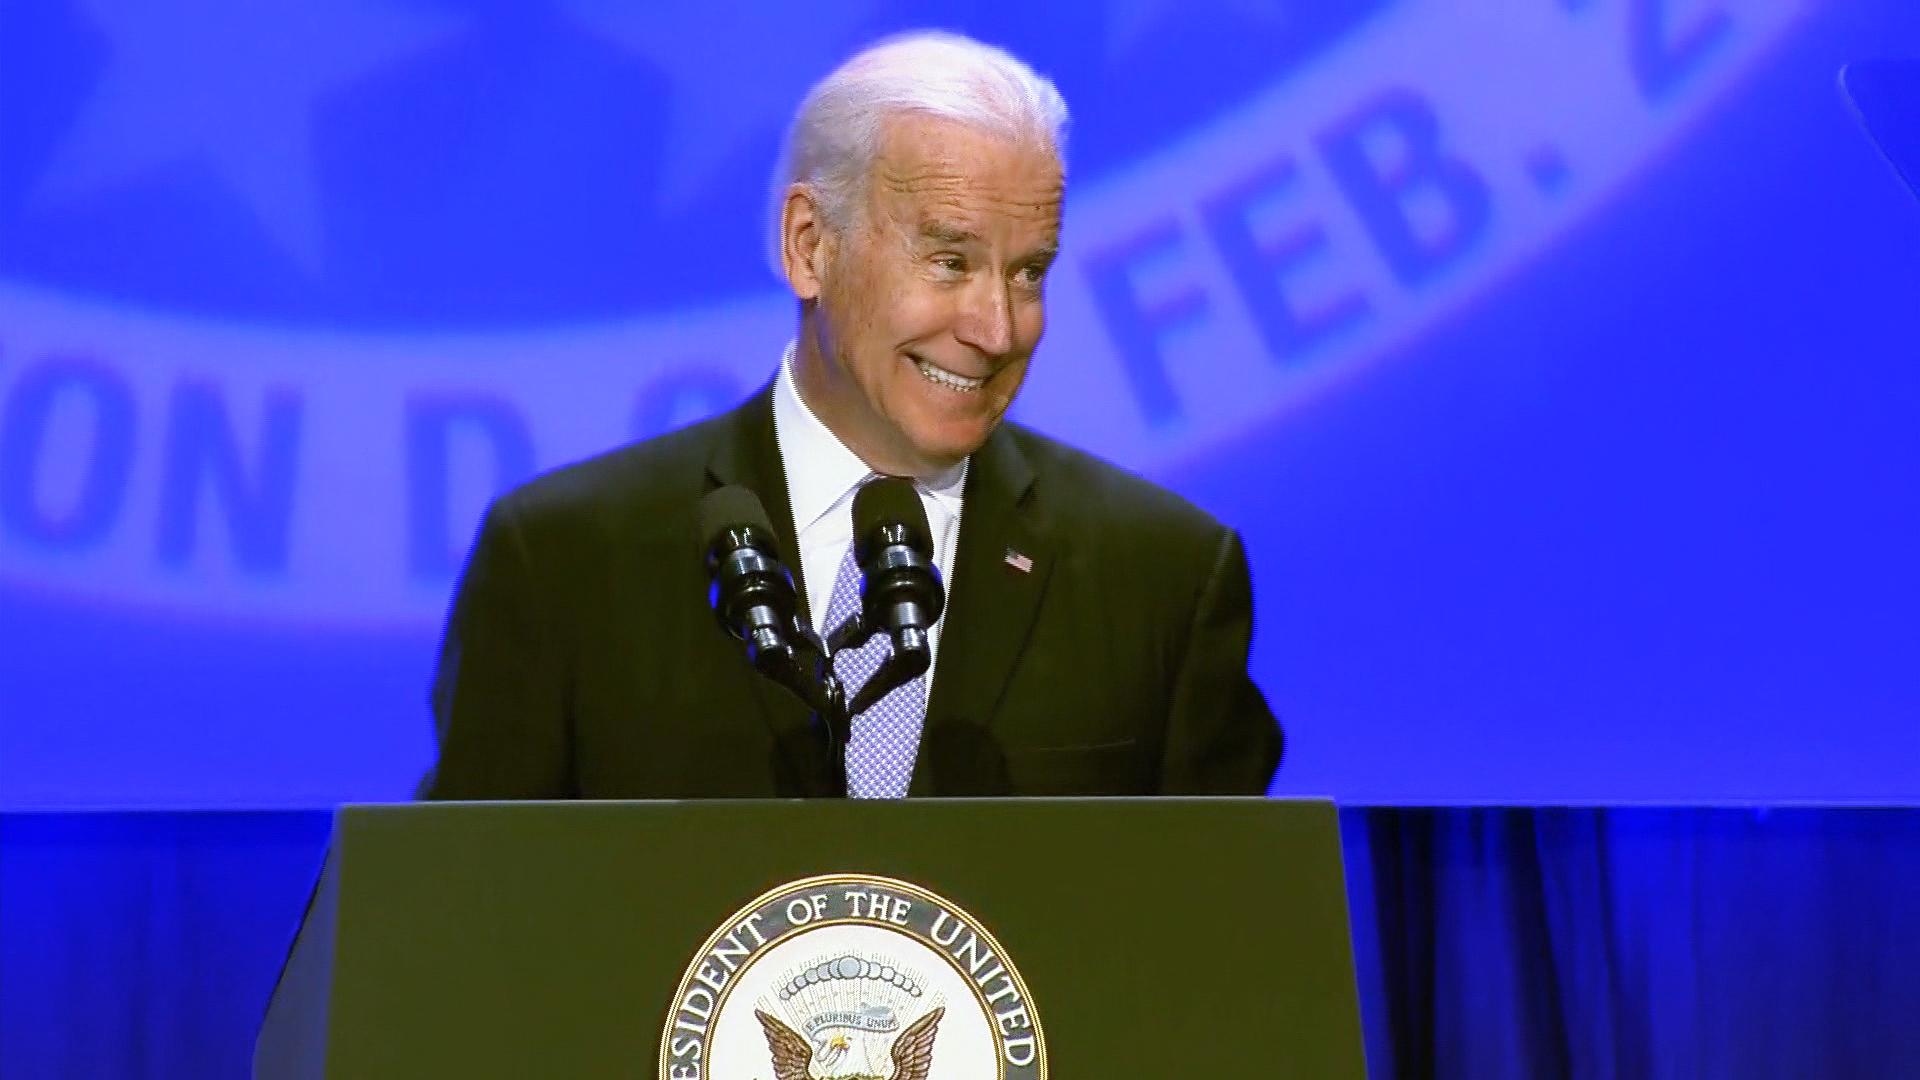 Biden's 'one reason' for not running in 2016